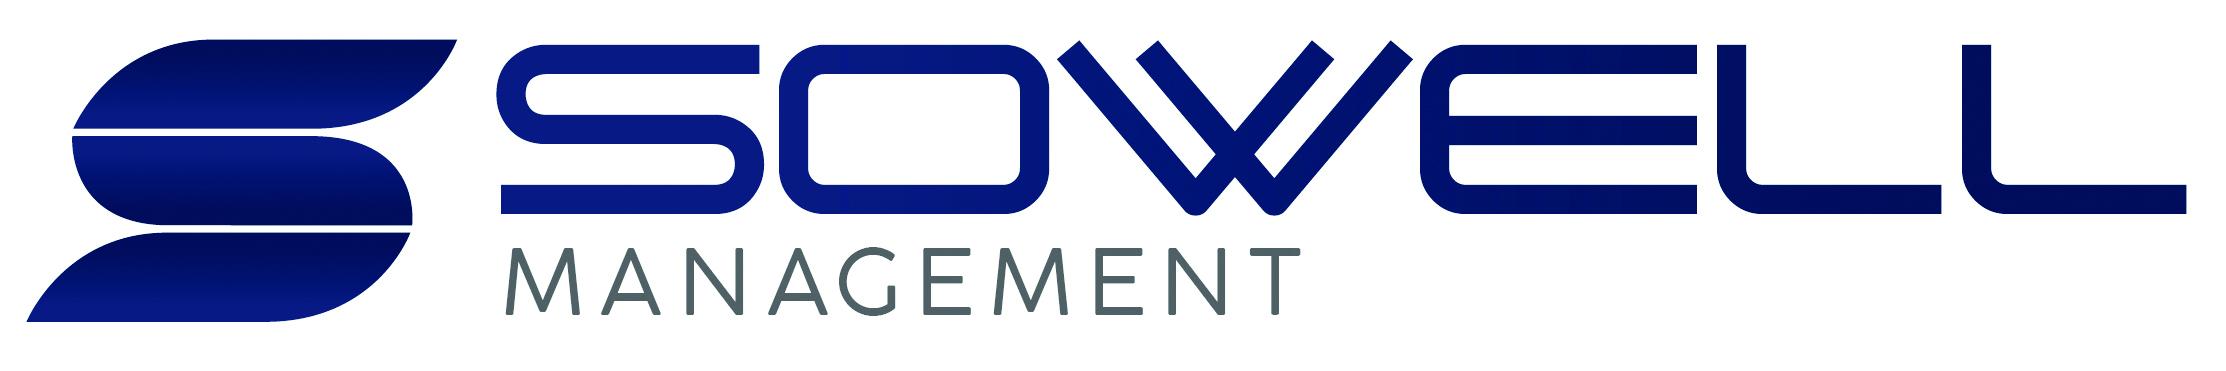 sowell logo4c